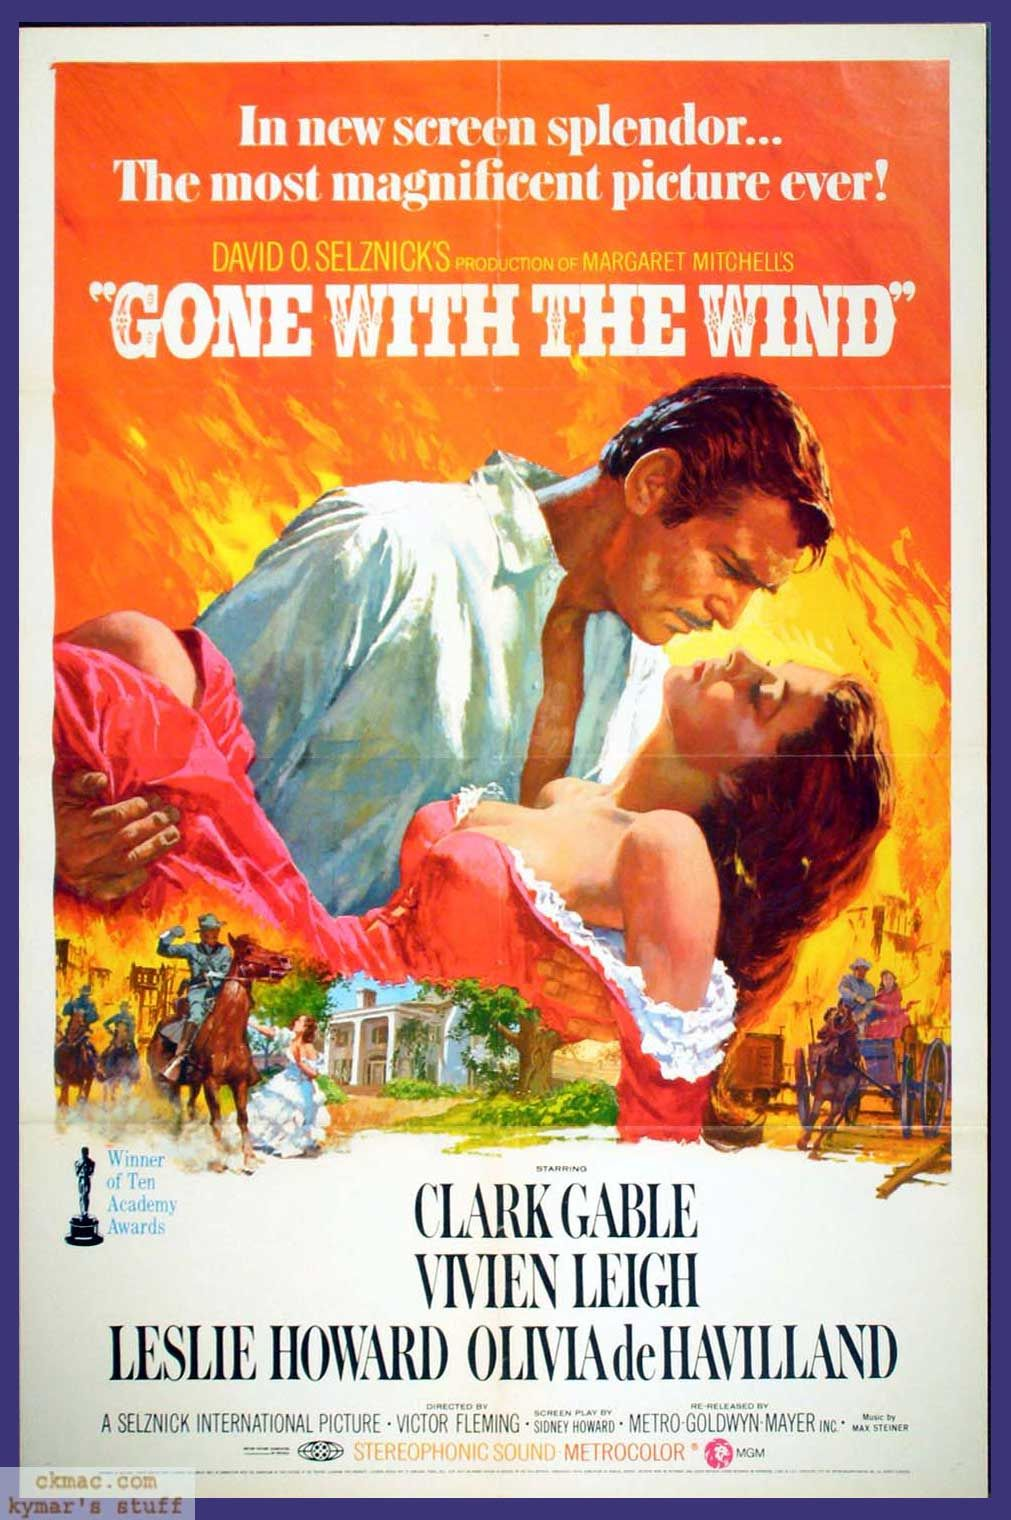 movie poster vintage retro - photo #31